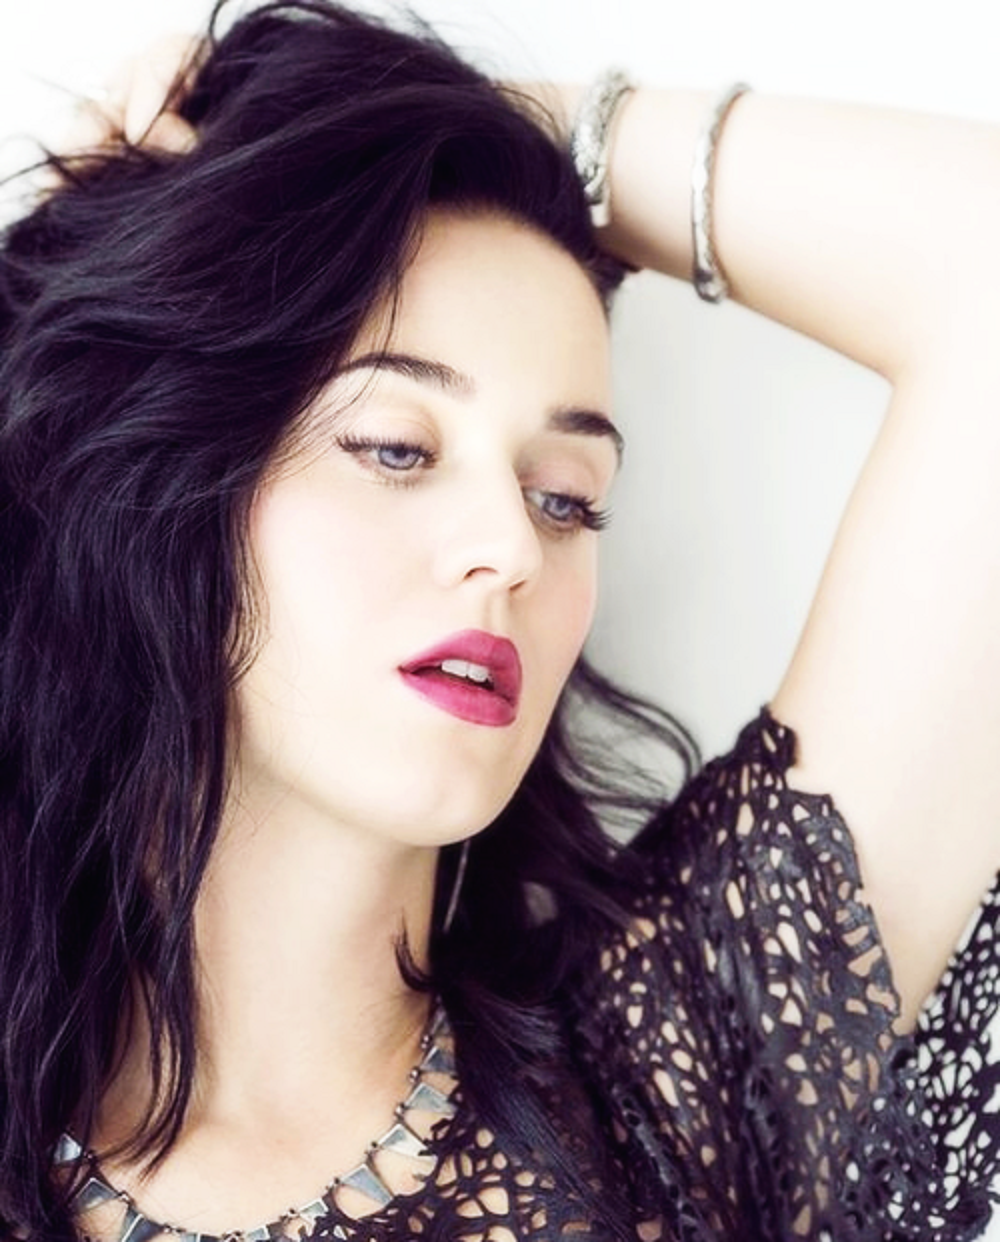 1000x1242px Katy Perry Hd Wallpaper Wallpapersafari